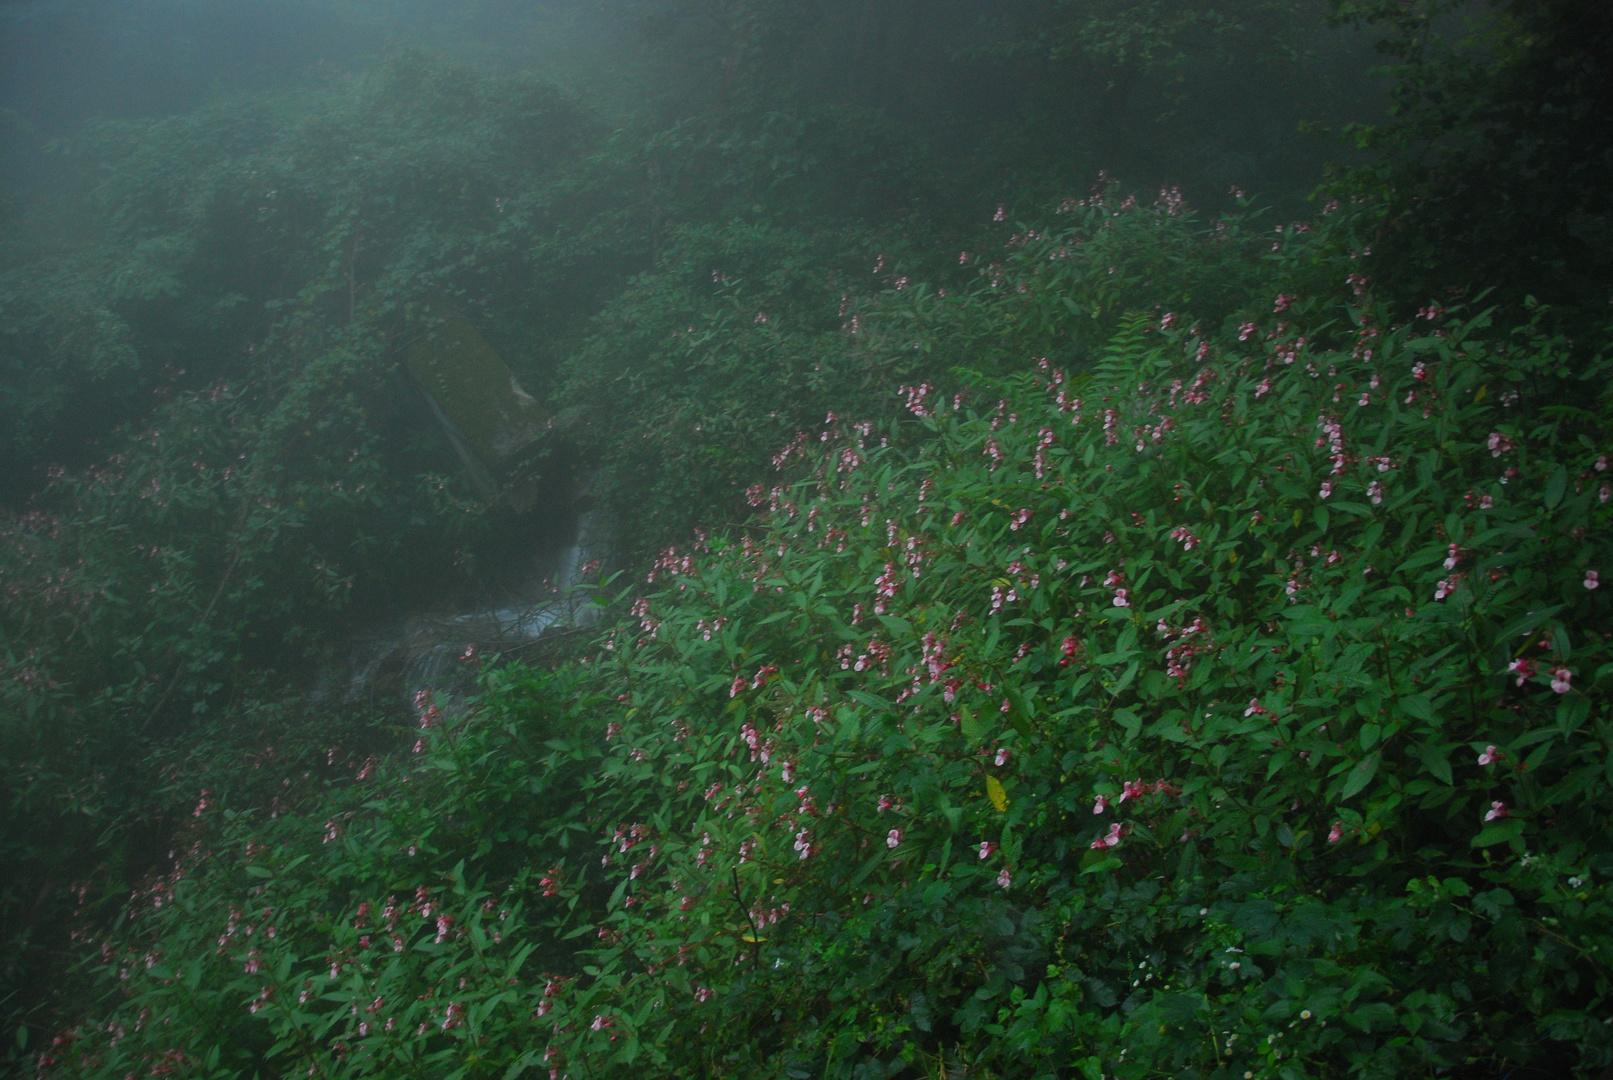 Springkraut im Nebel